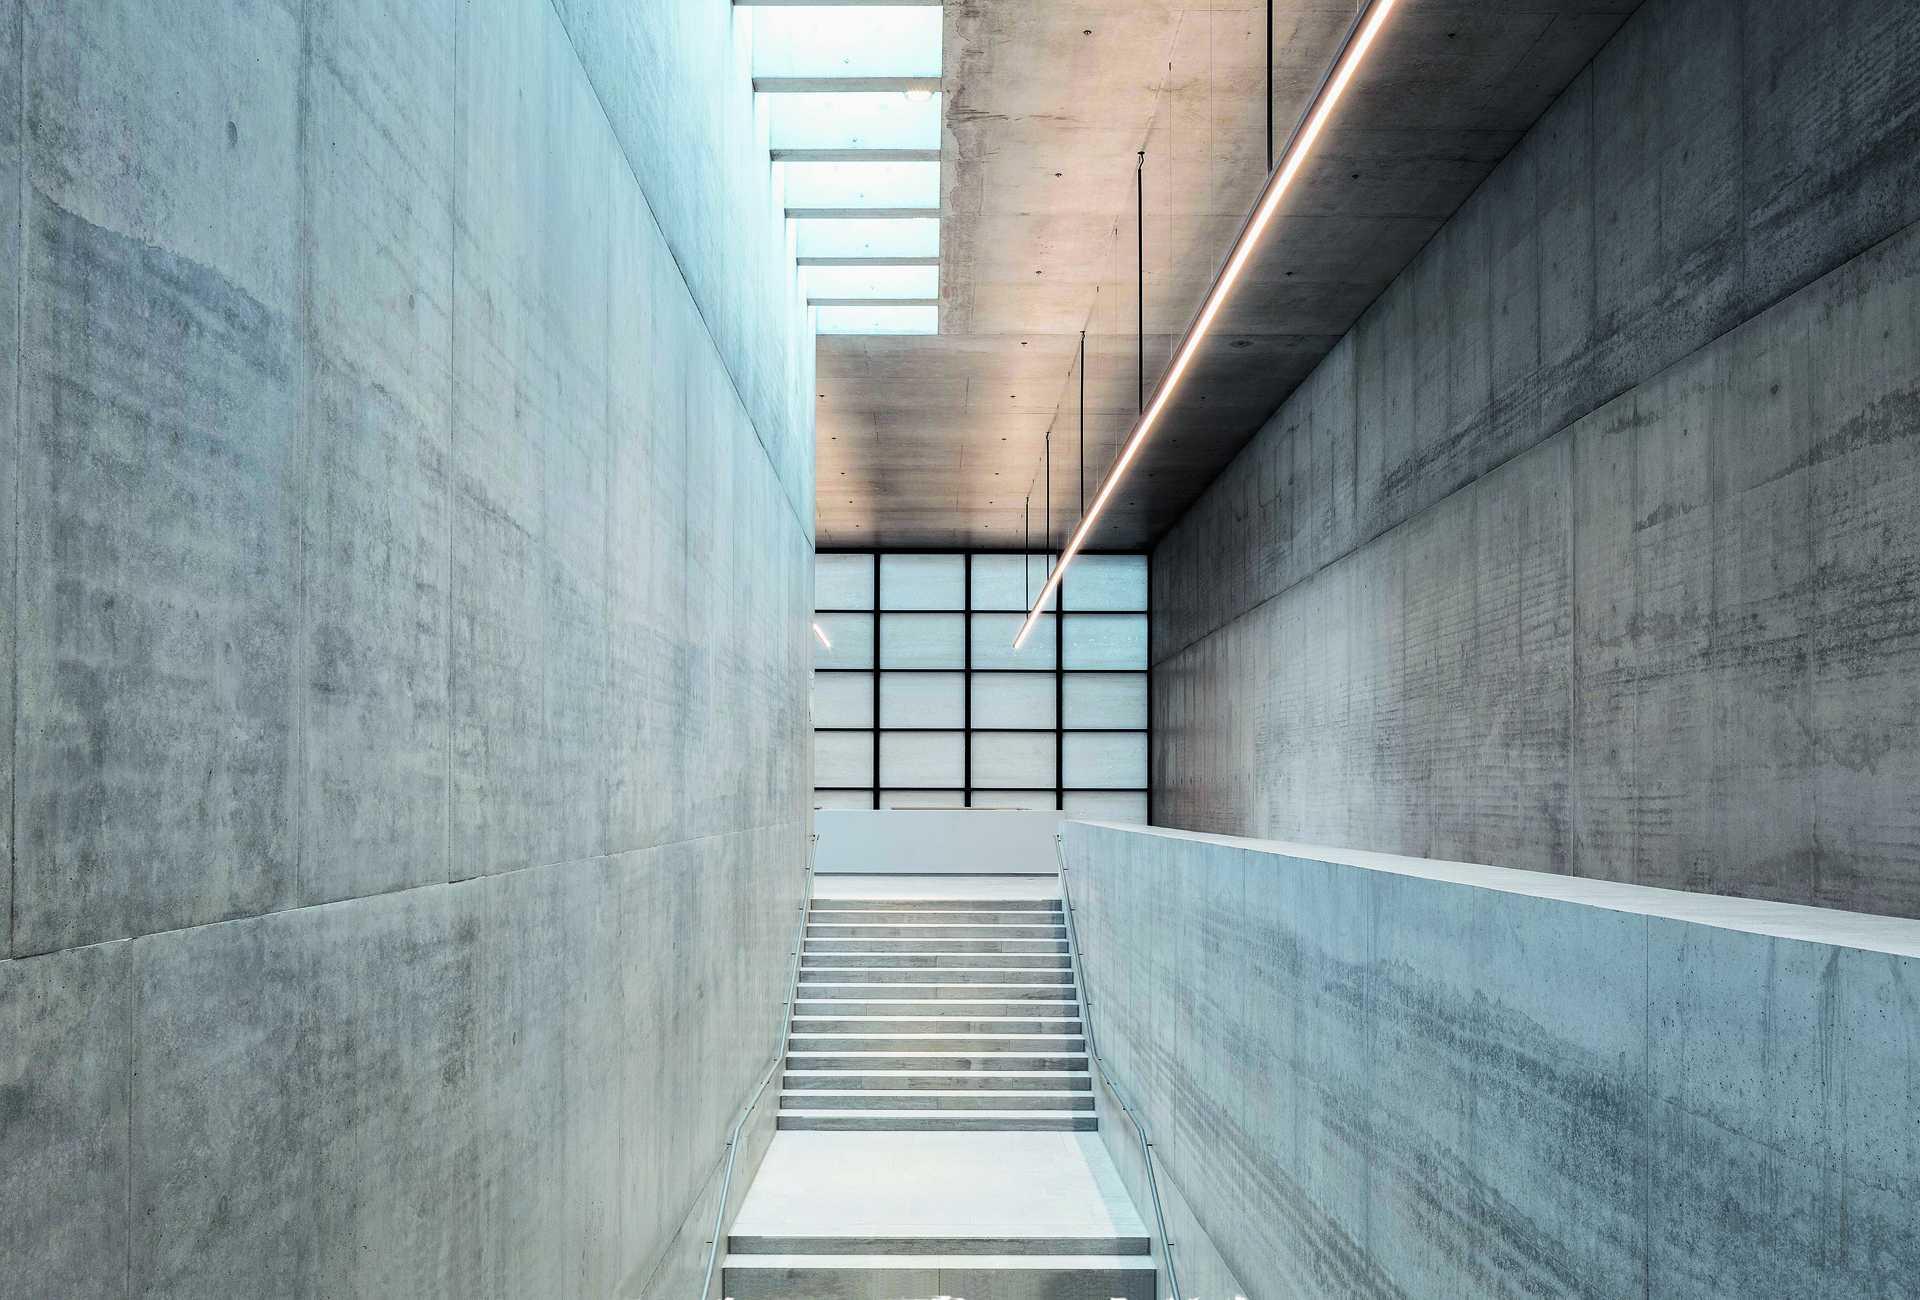 James Simon Galerie  - 37 6 42